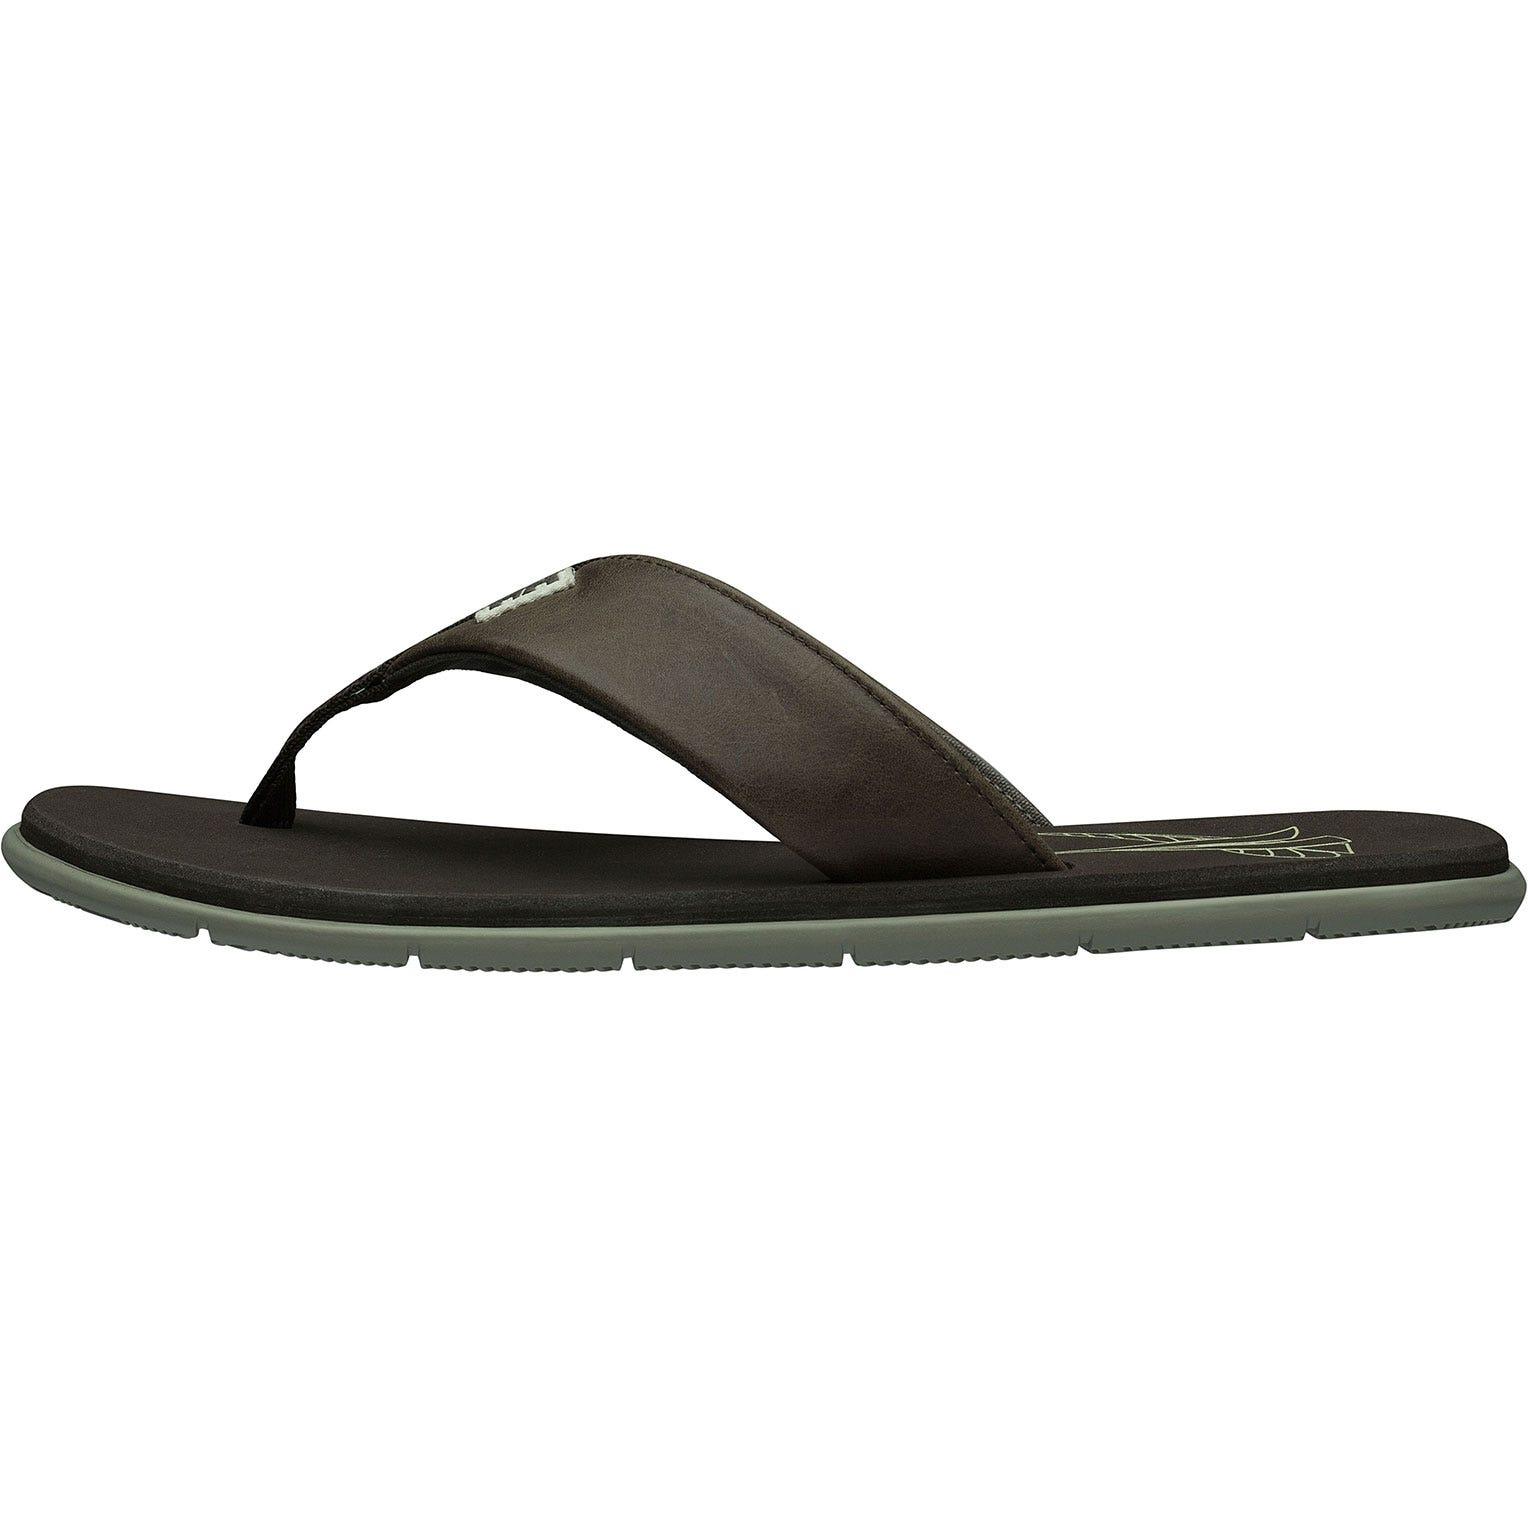 Helly Hansen W Seasand Leather Sandal Womens Brown 36/5